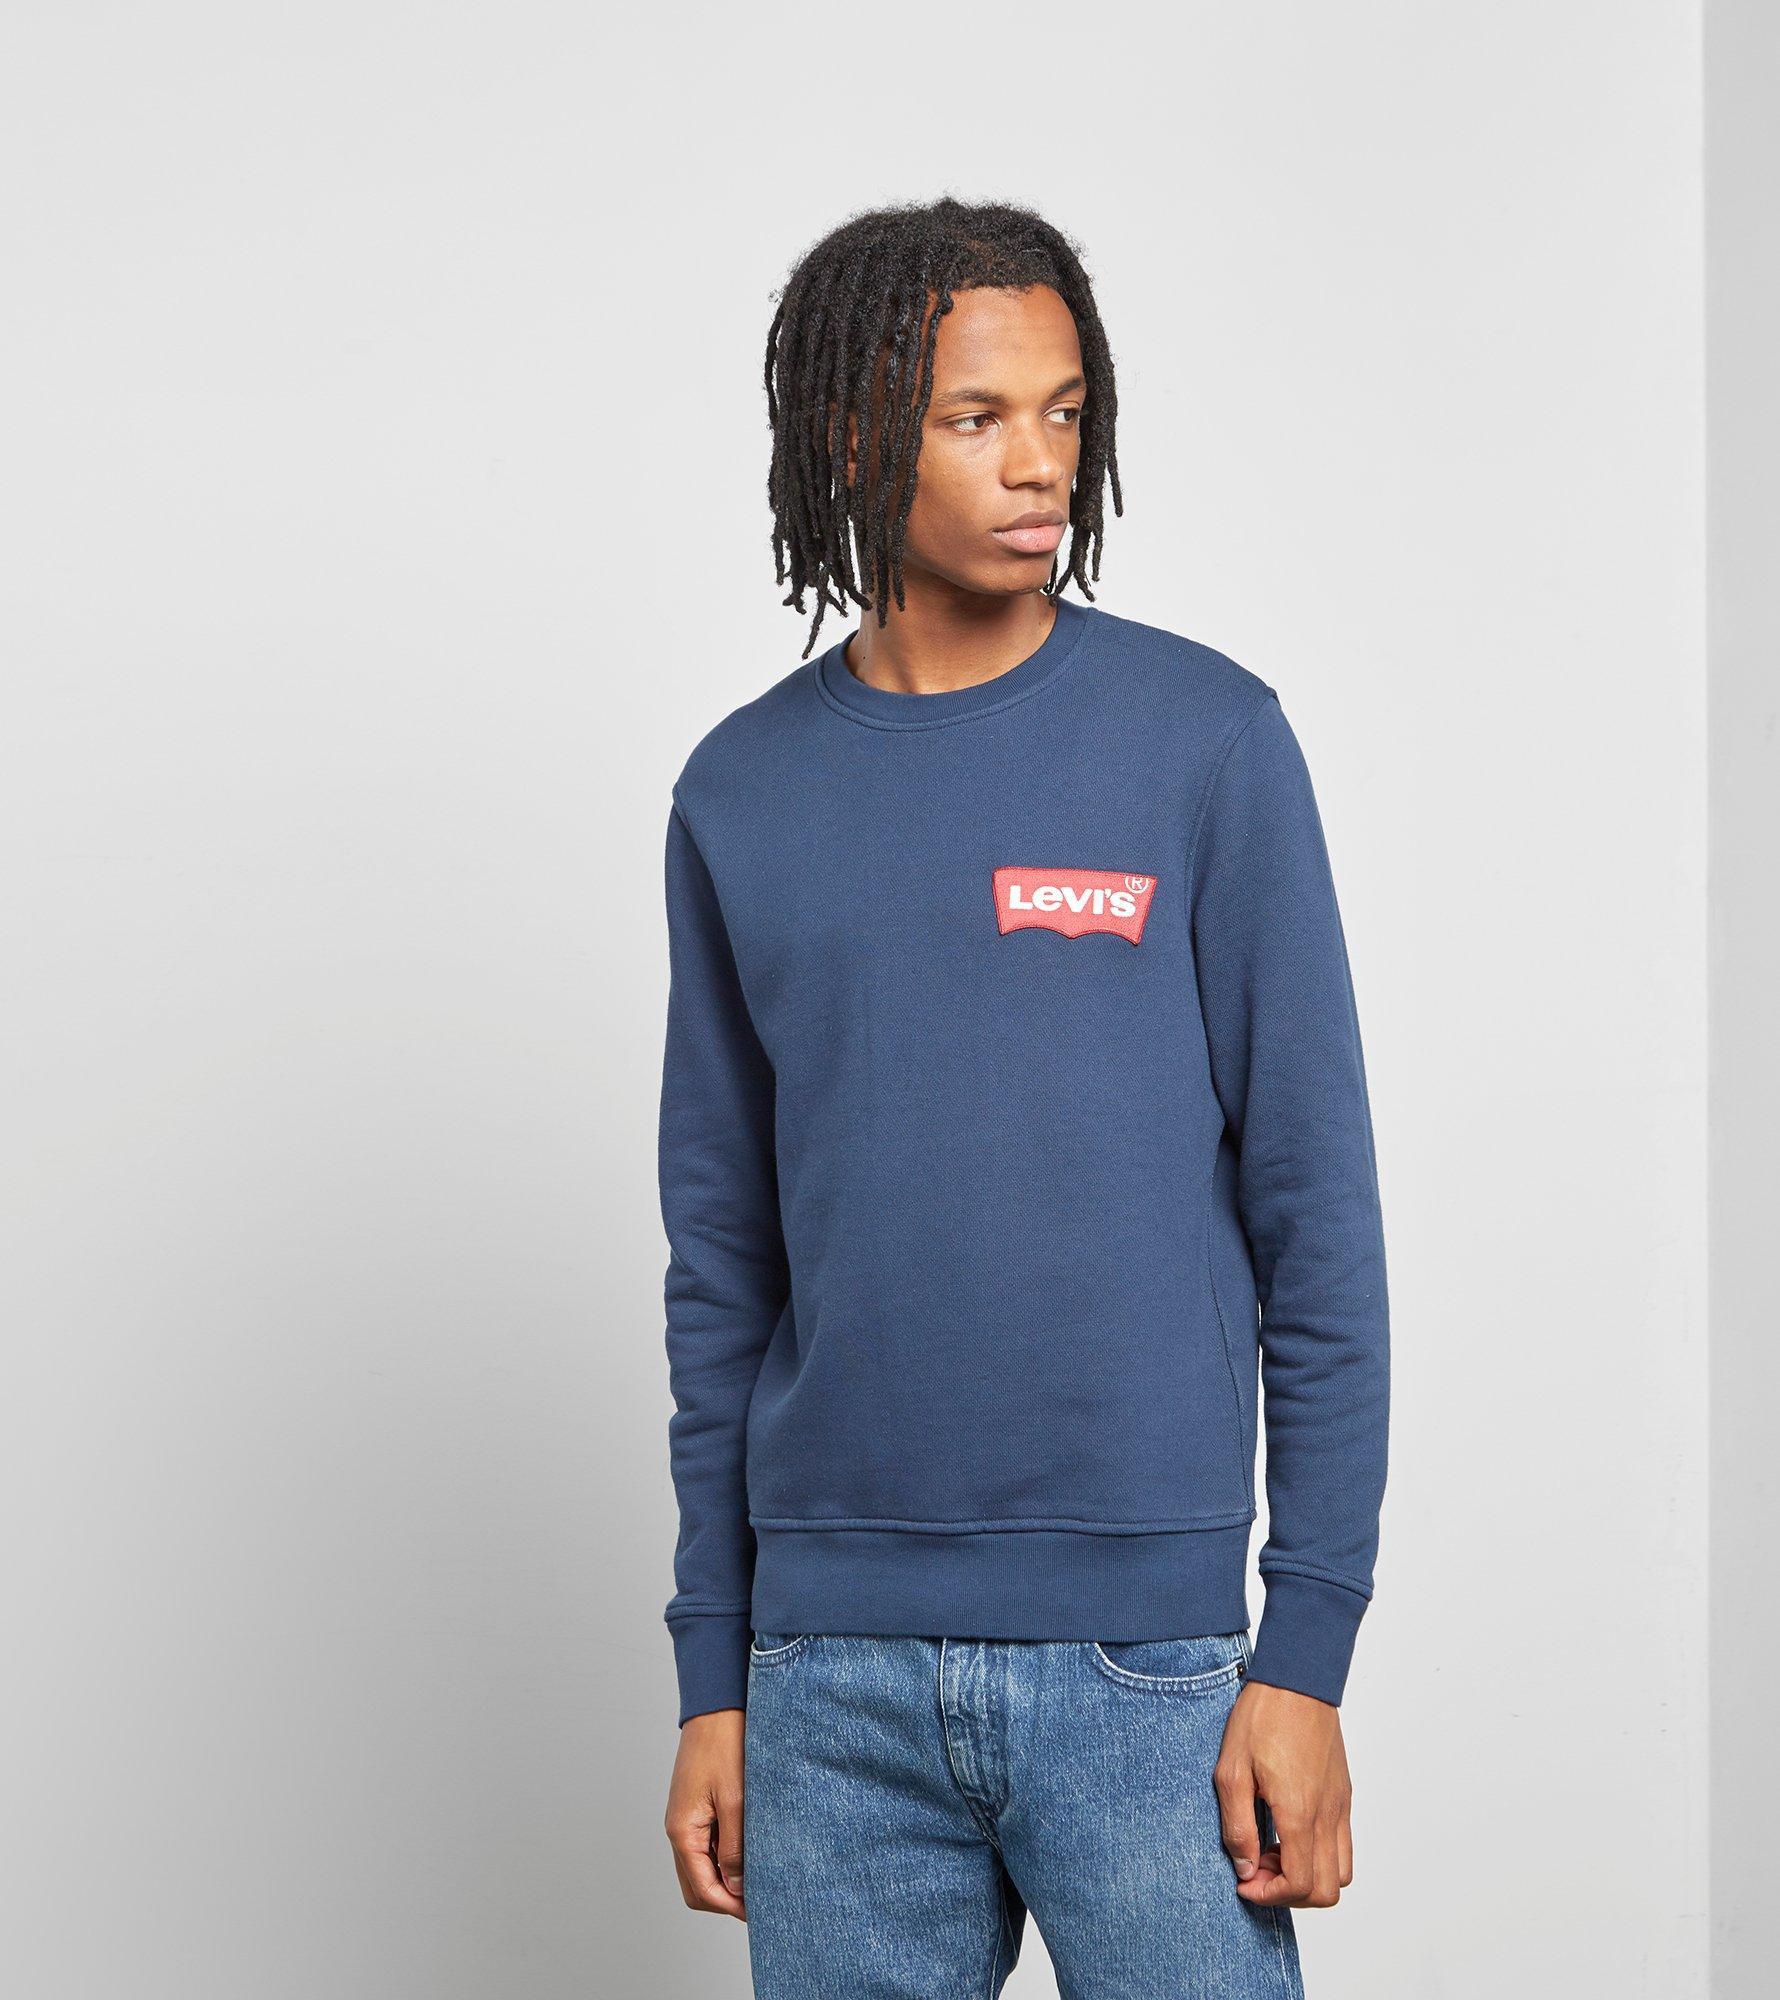 bcceb772e40 Levi S Levis Modern Crewneck Sweatshirt in Blue for Men - Lyst